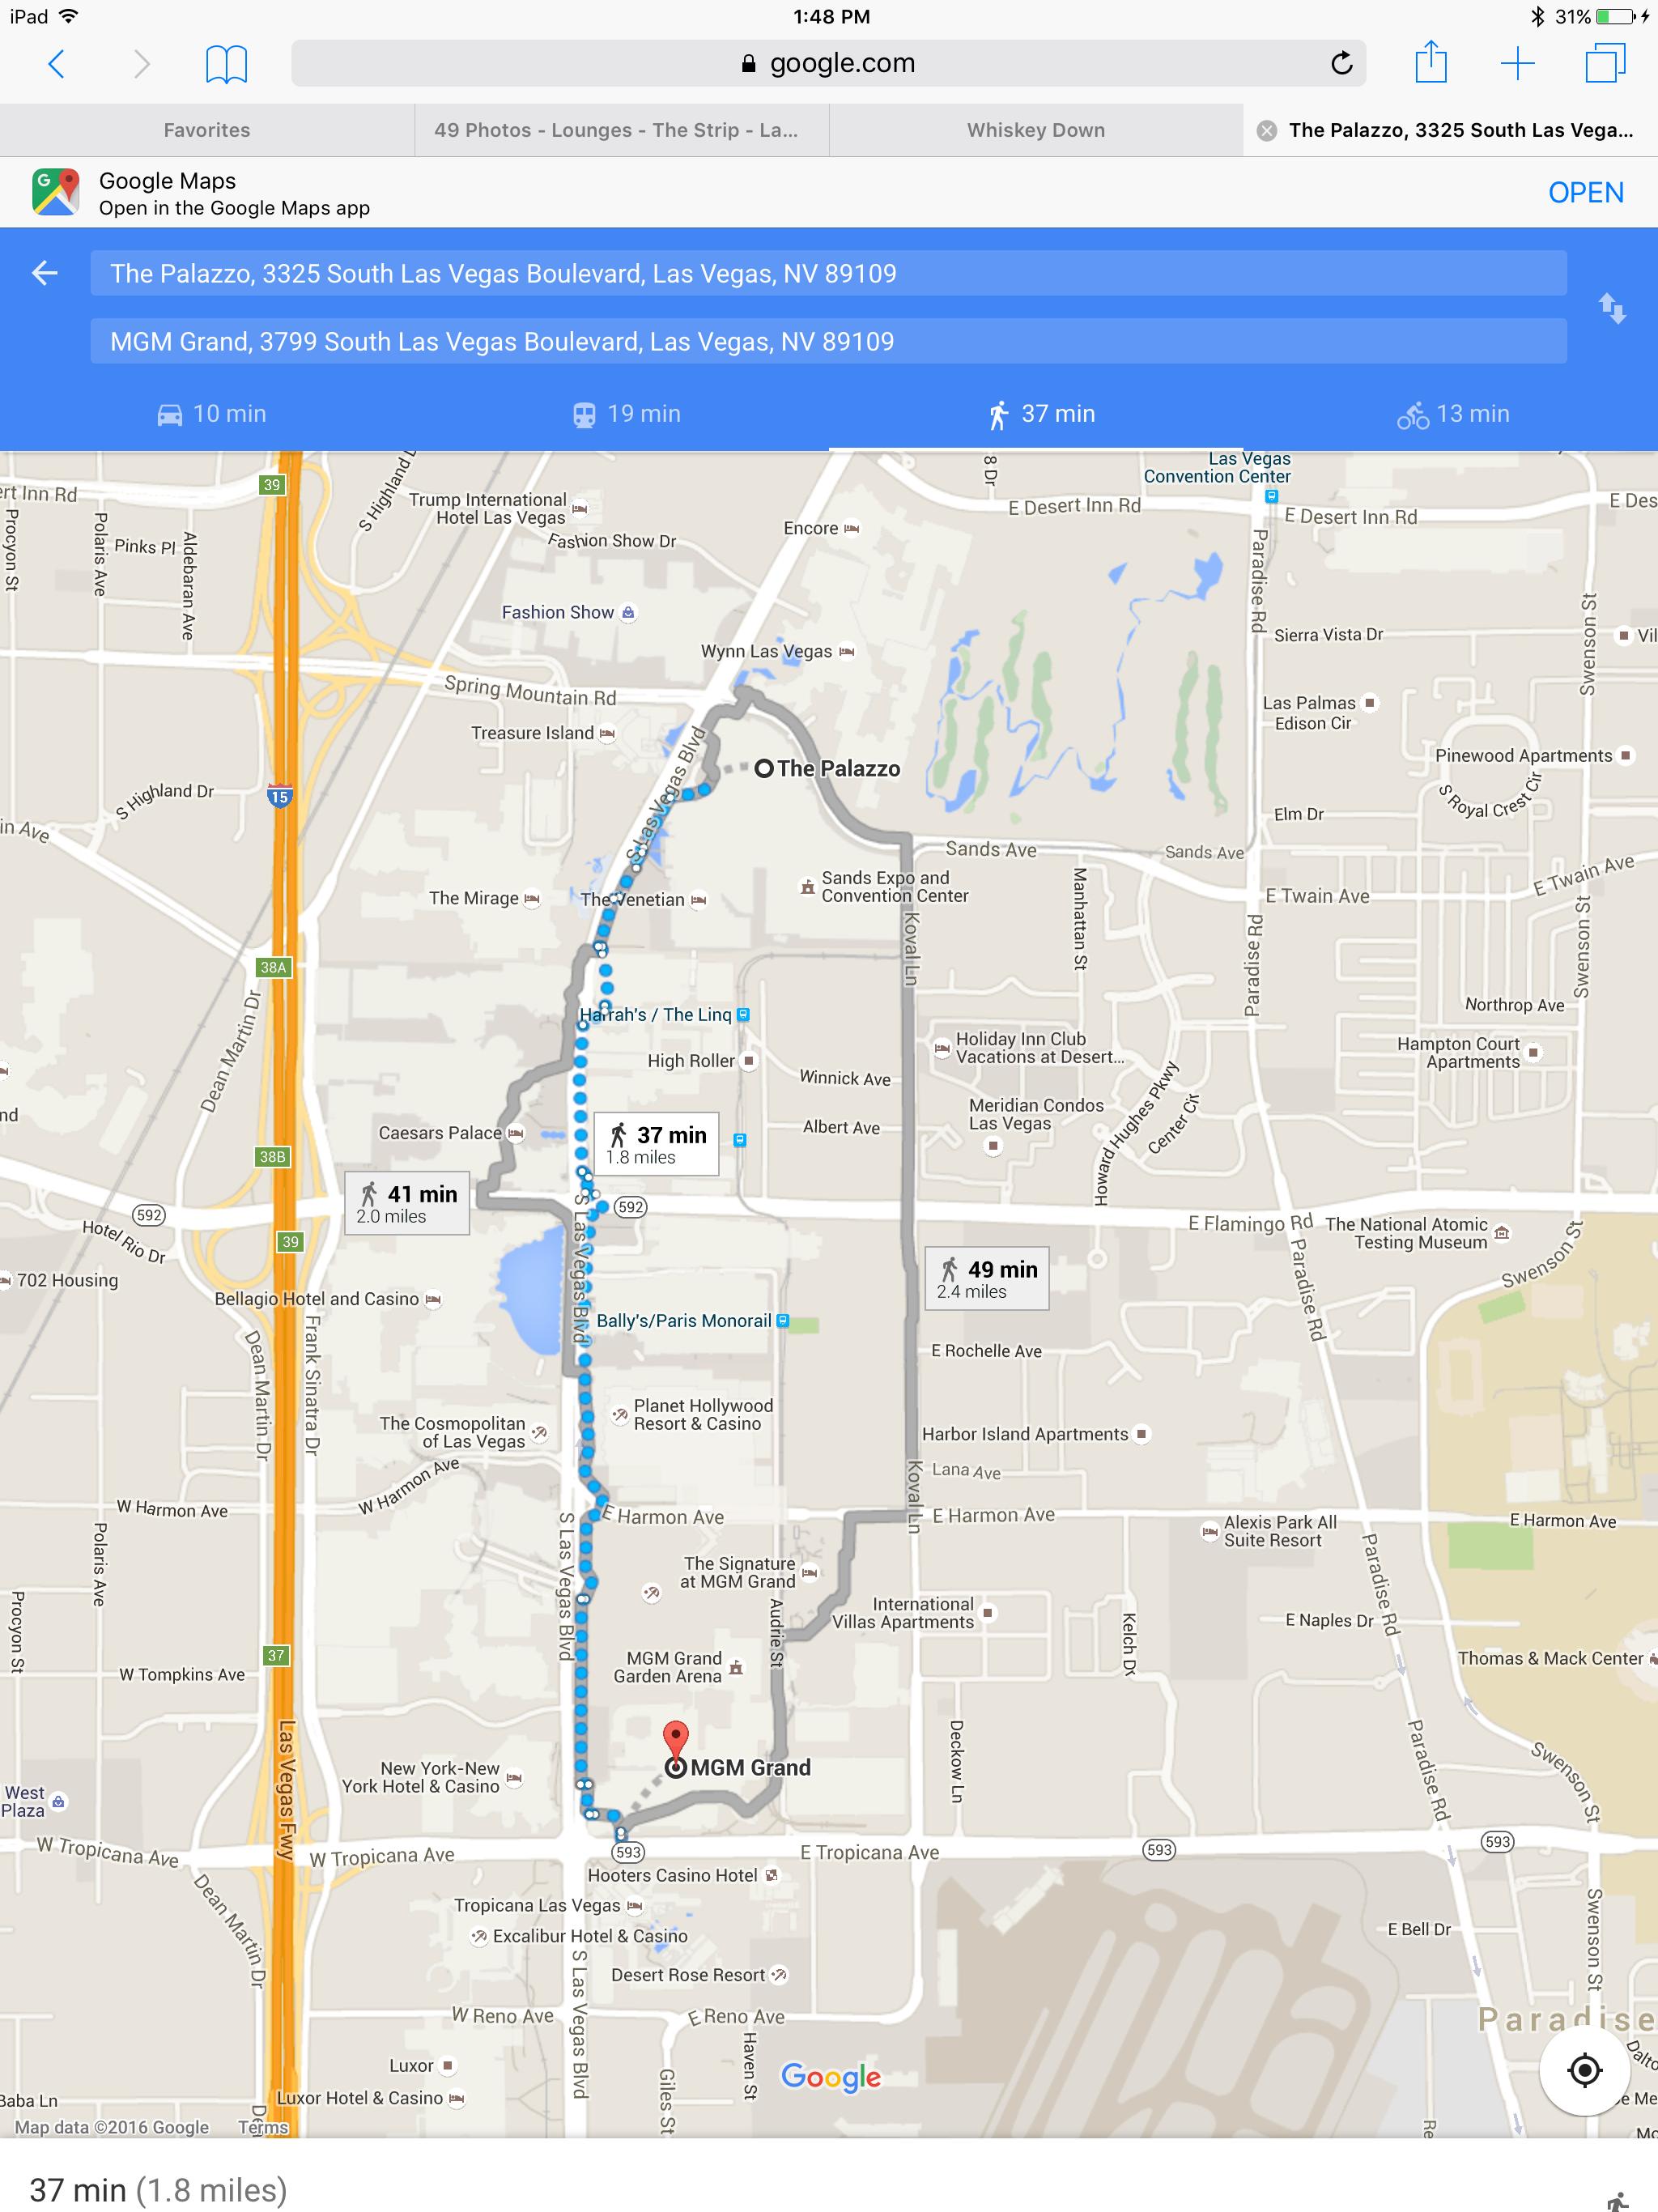 MGM hotel Las vegas boulevard, Google maps app, Mgm